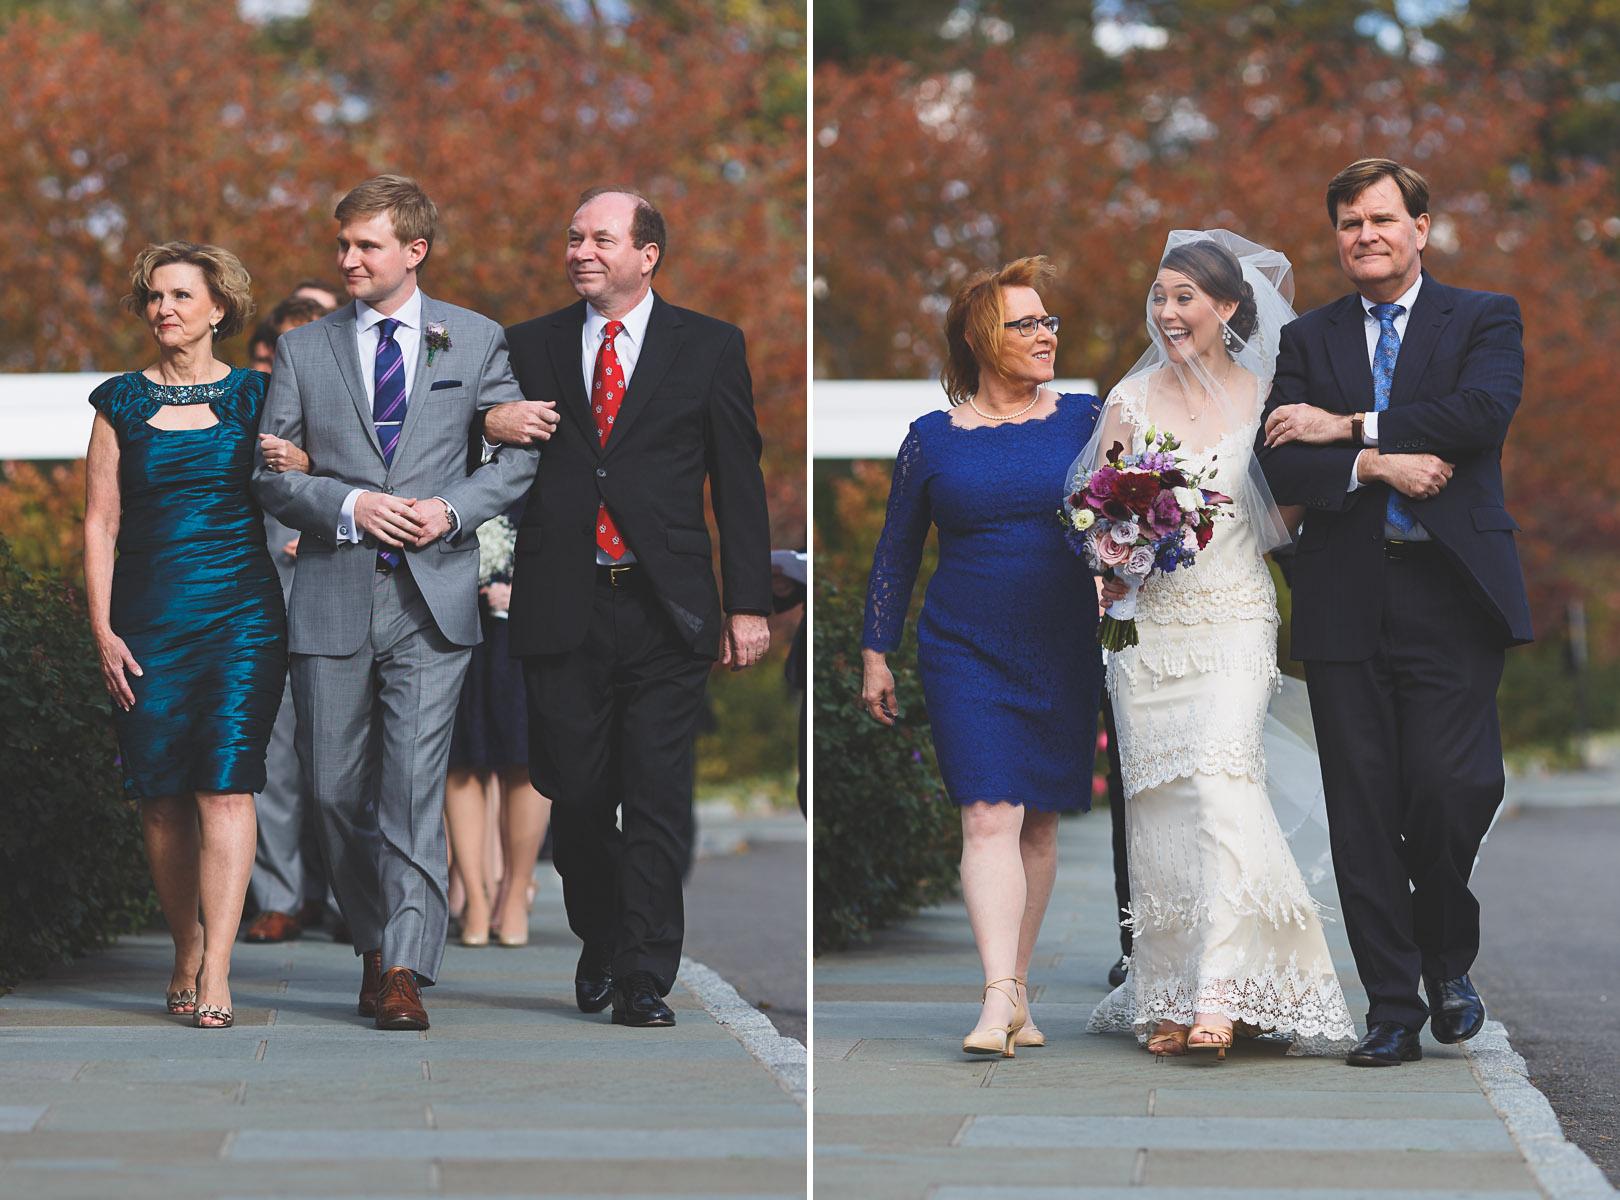 sm-garrison-ny-wedding-22.jpg